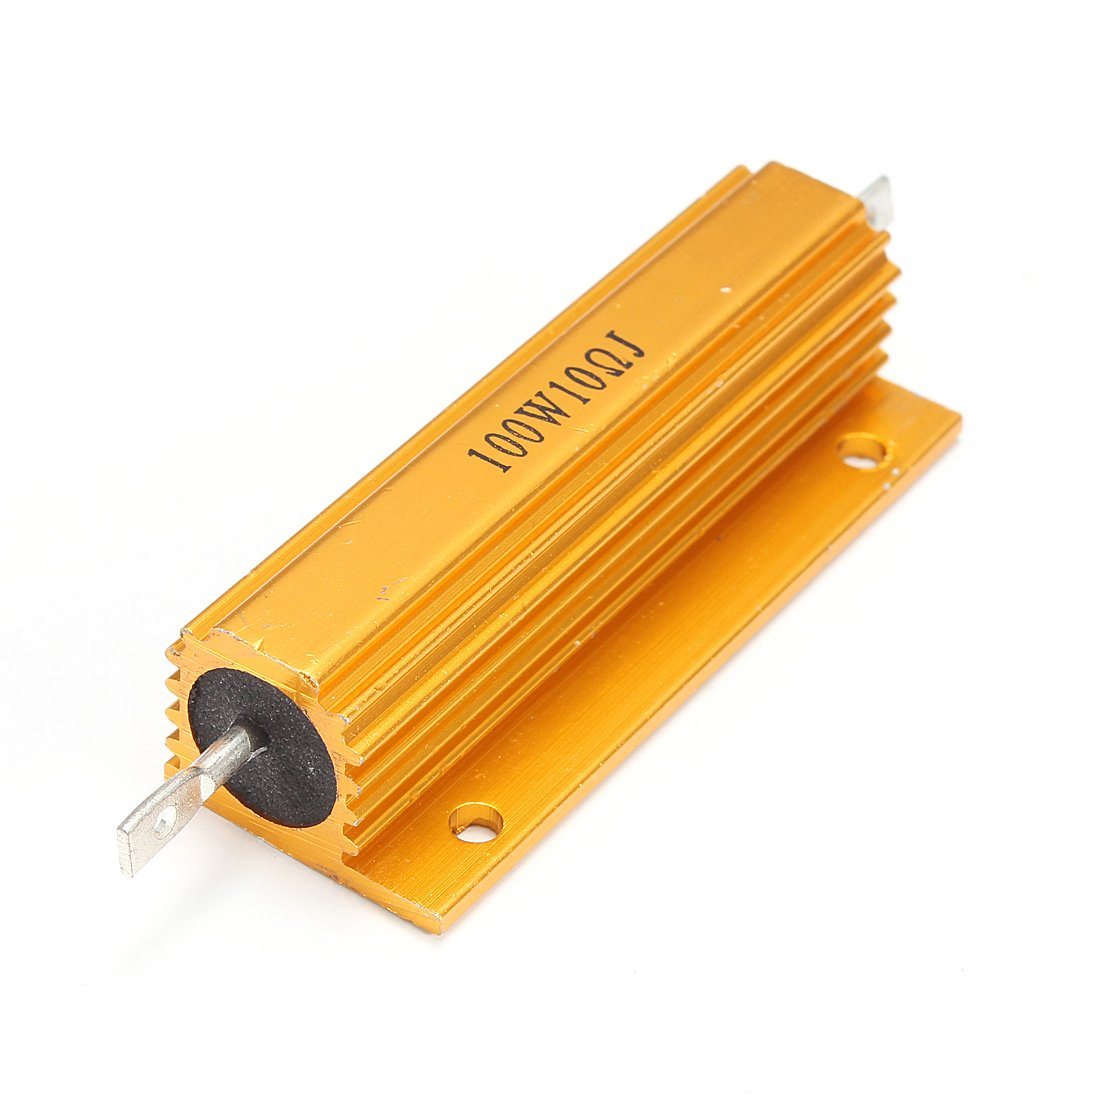 100W Watt Power Metal Shell Case Wirewound Resistor